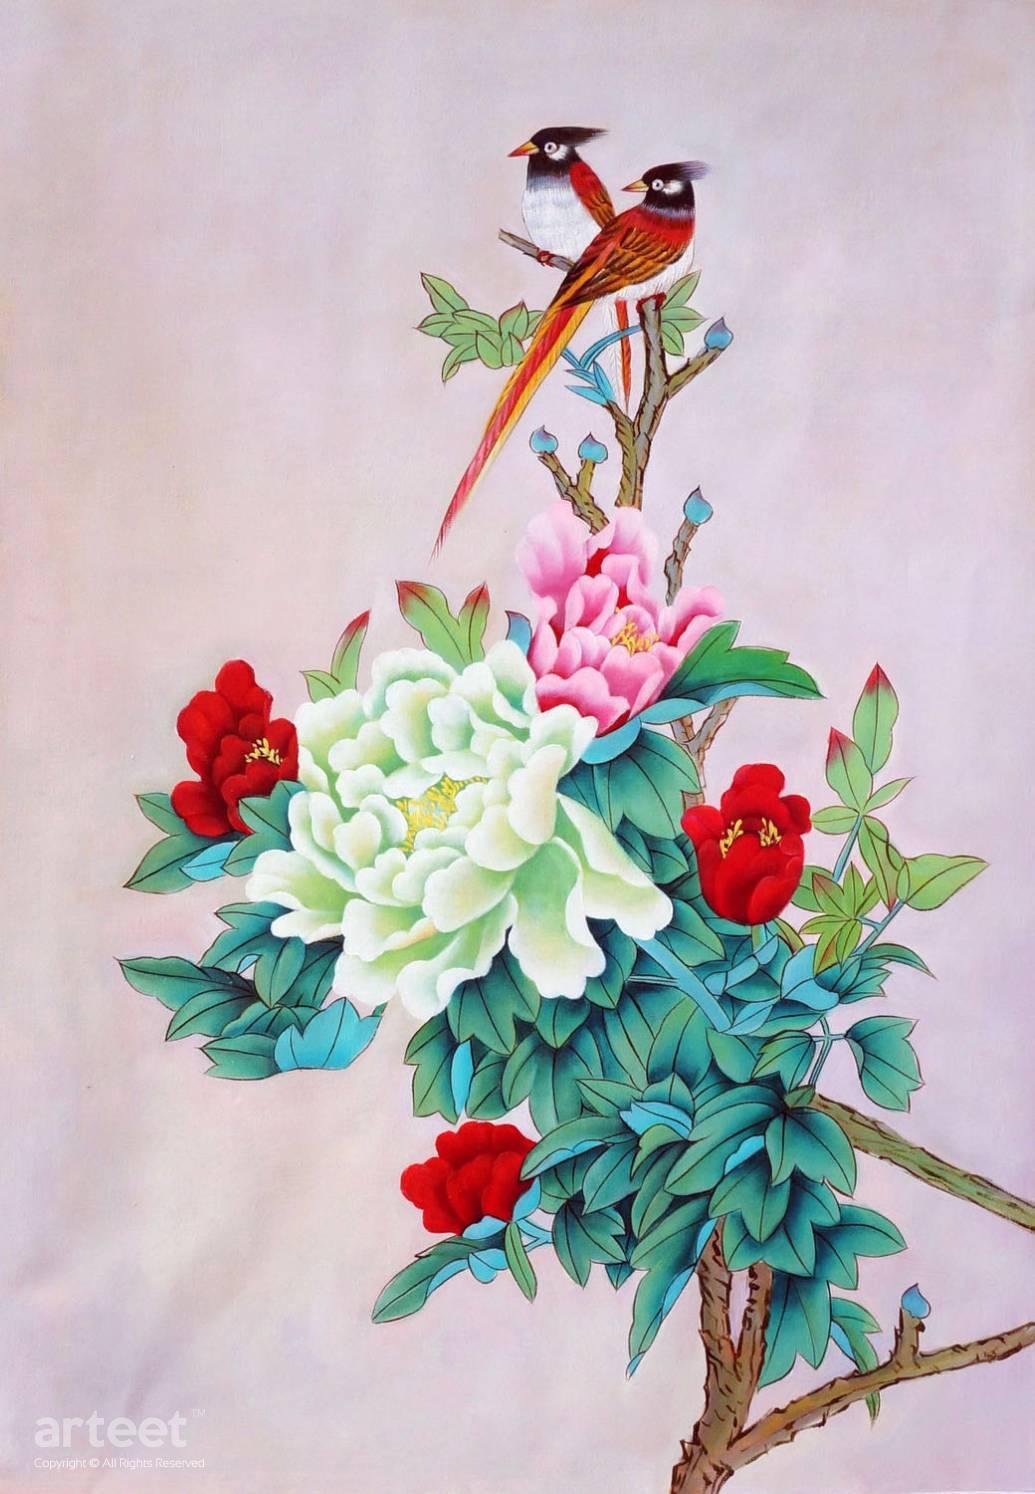 oriental birds art paintings for sale arteet�